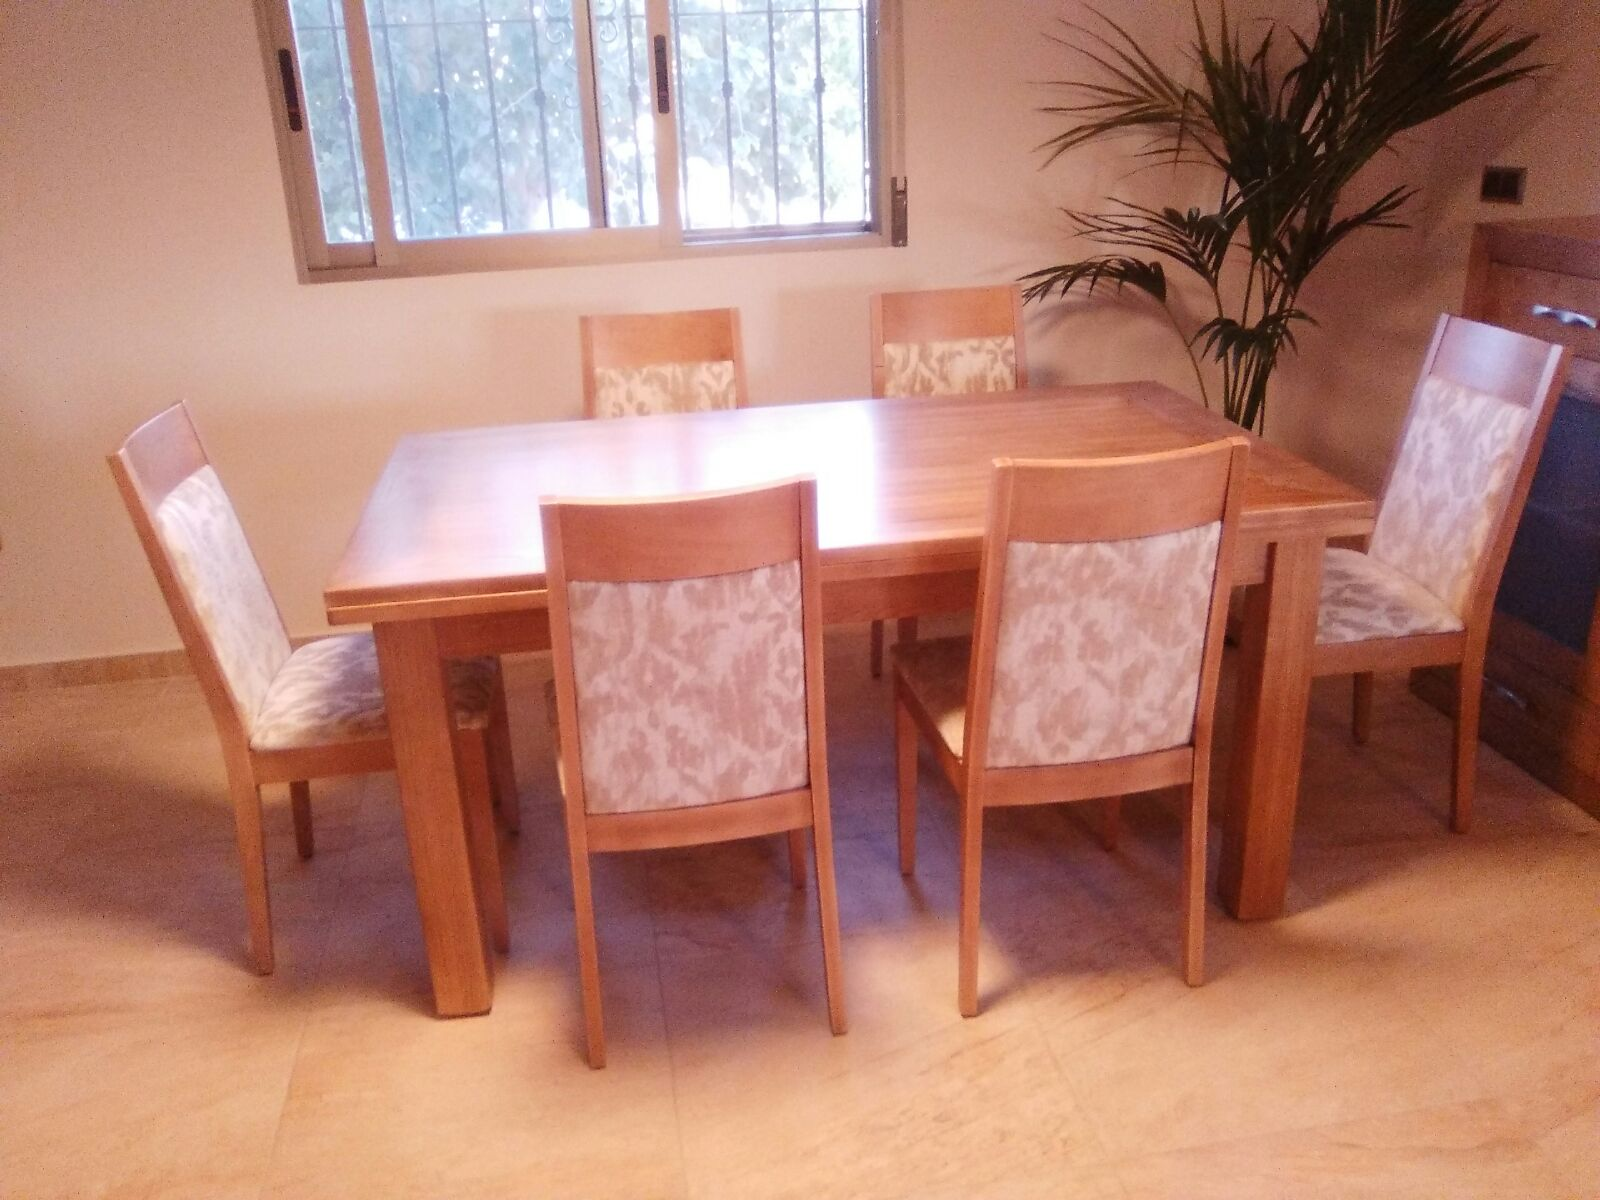 Muebles arcecoll comedor a medida de madera maciza de fresno - Muebles de madera a medida ...